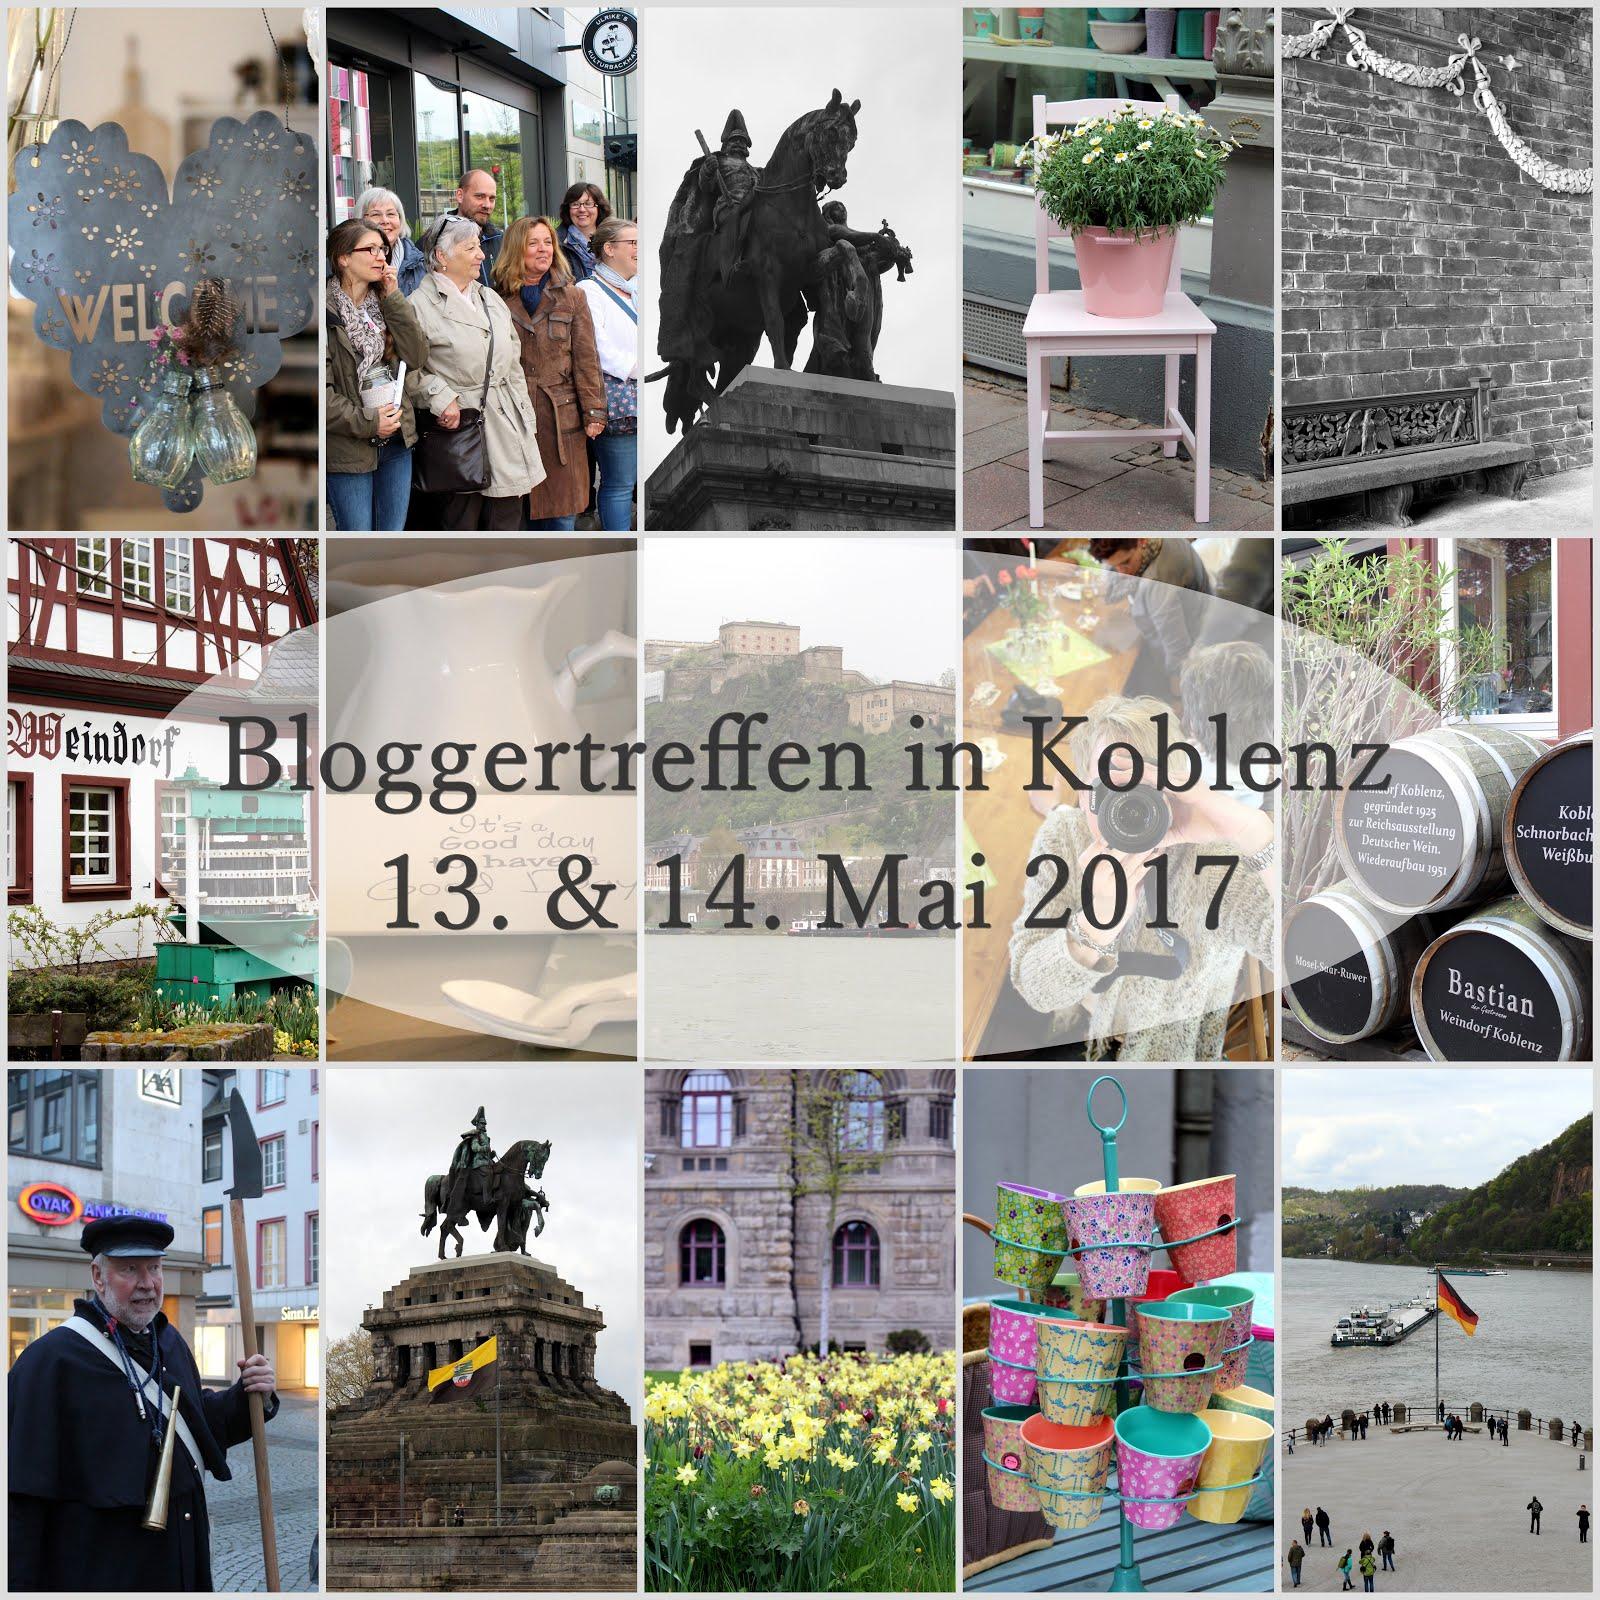 Bloggertreffen Koblenz 2017